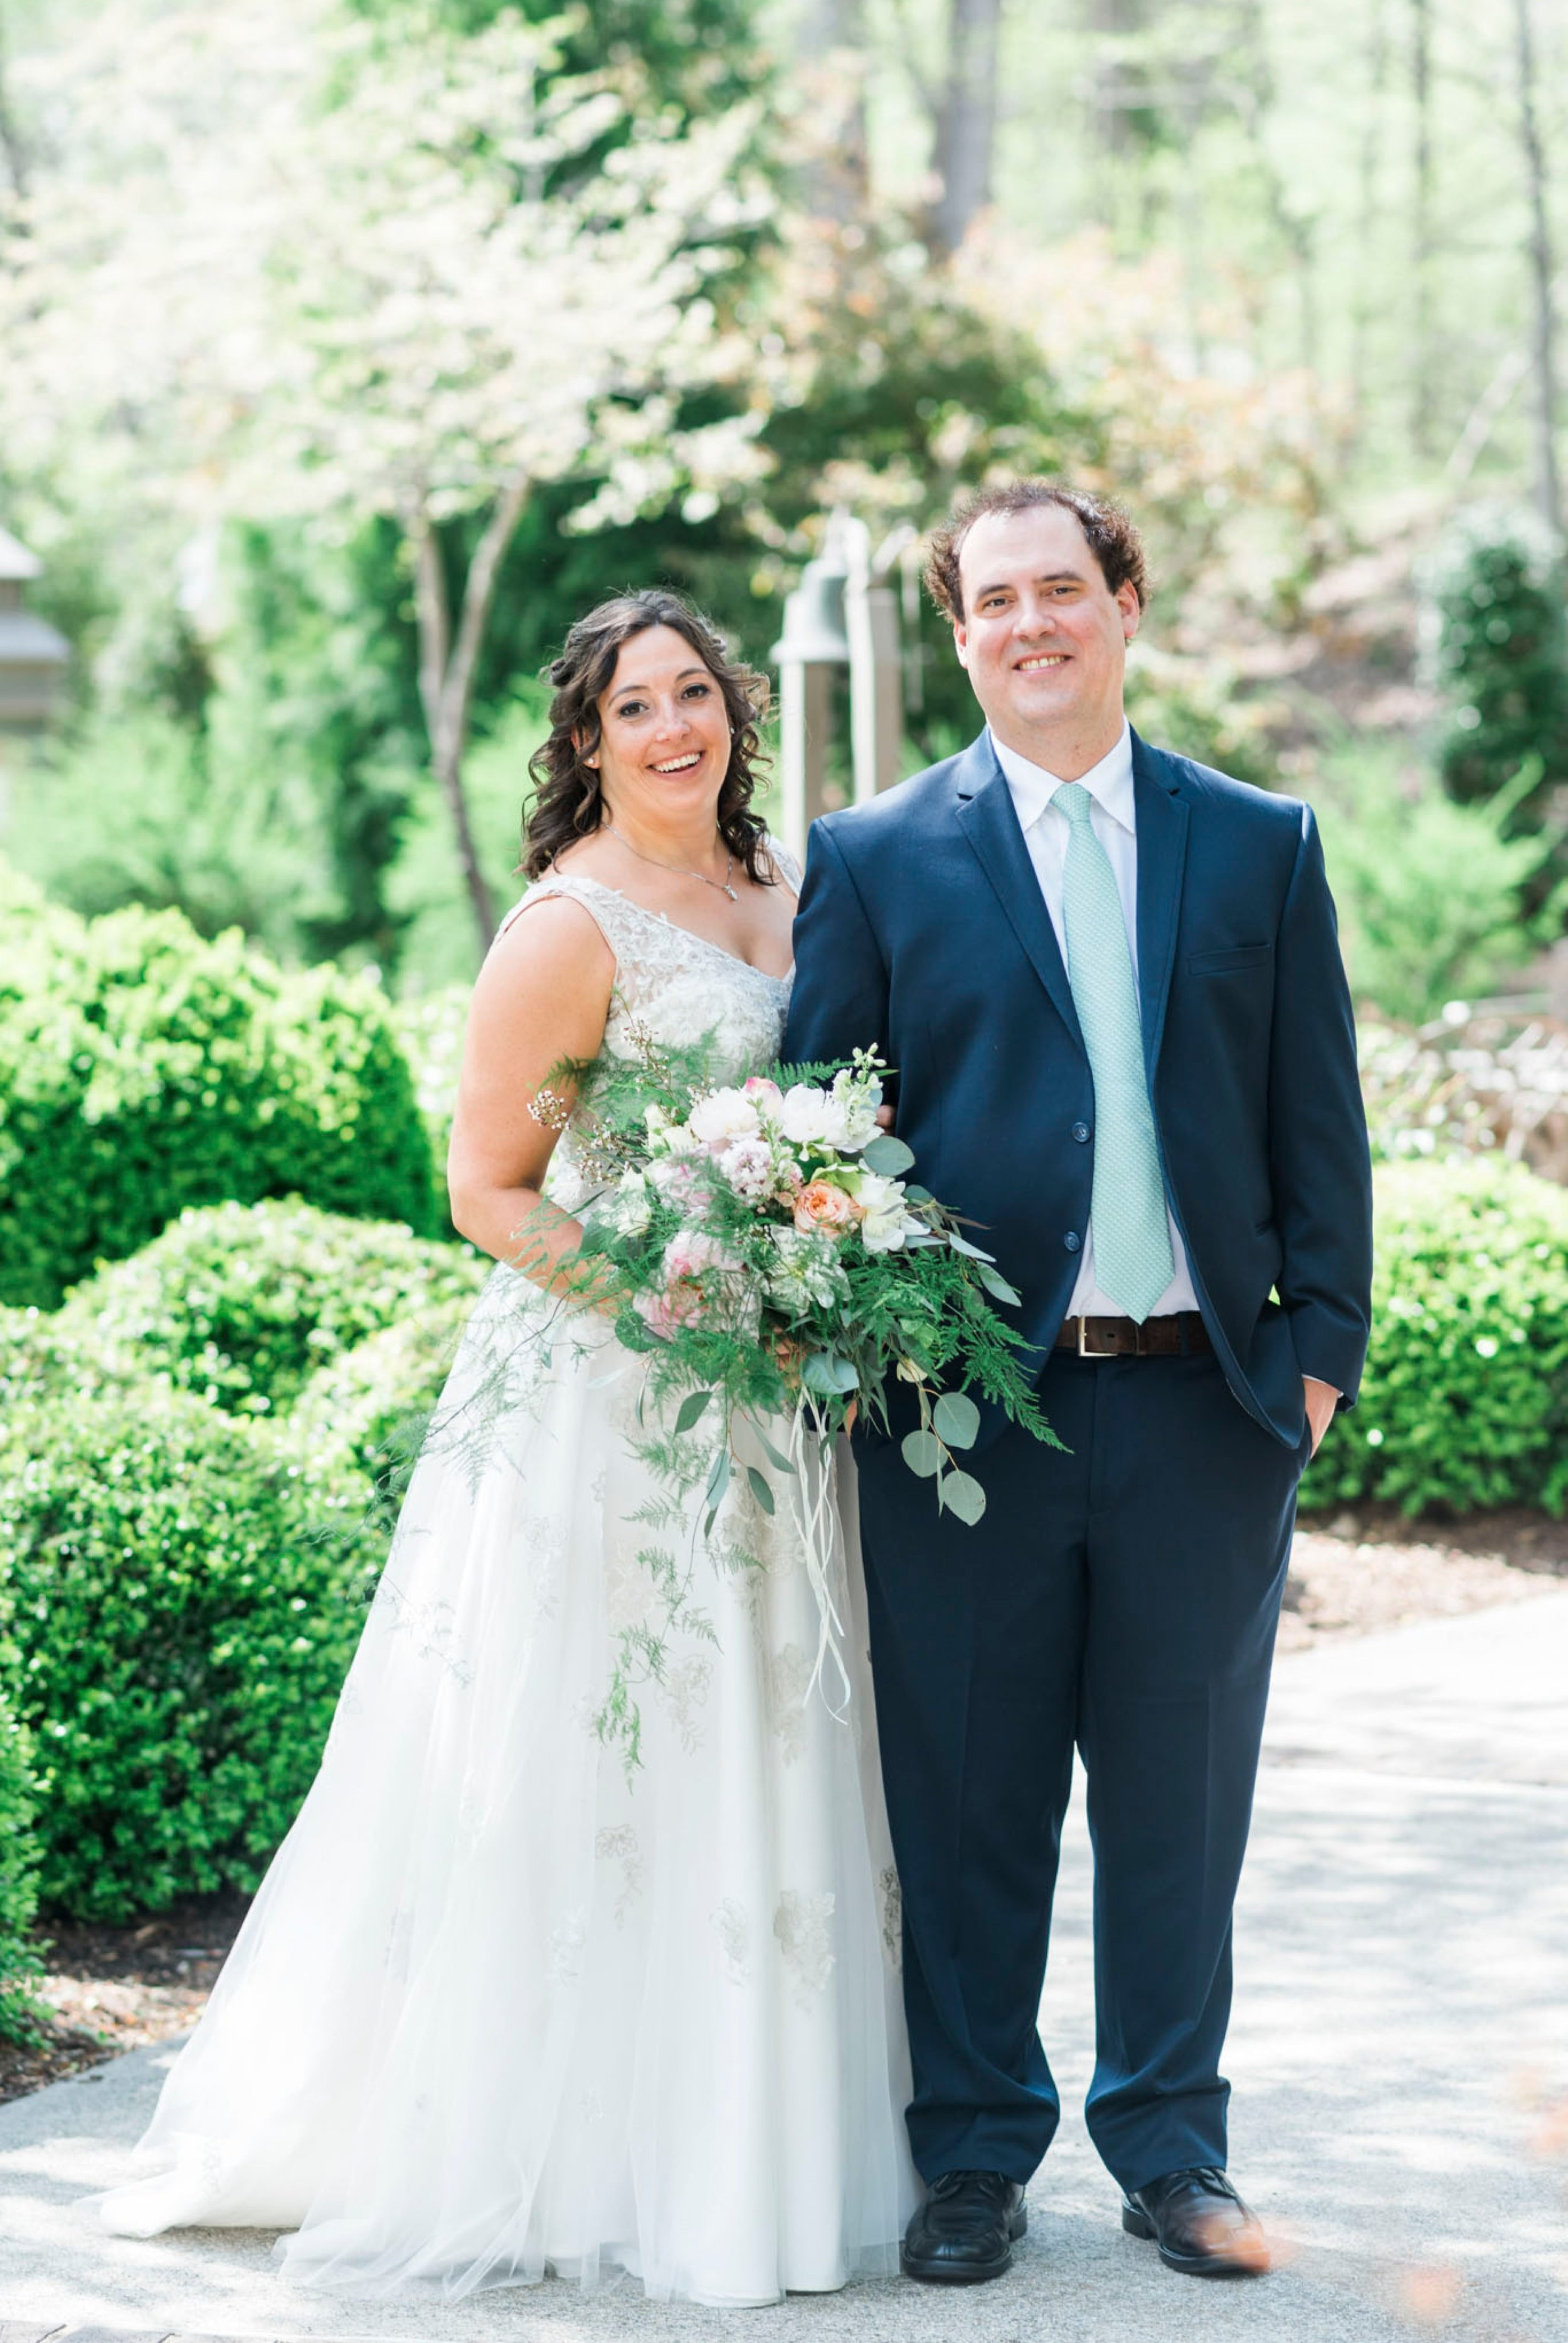 TheVirginianHotel_LynchburgVA_TheVirginianHotelWedding_Virginiaweddingphotographer_Lynchburgvawedding 21.jpg